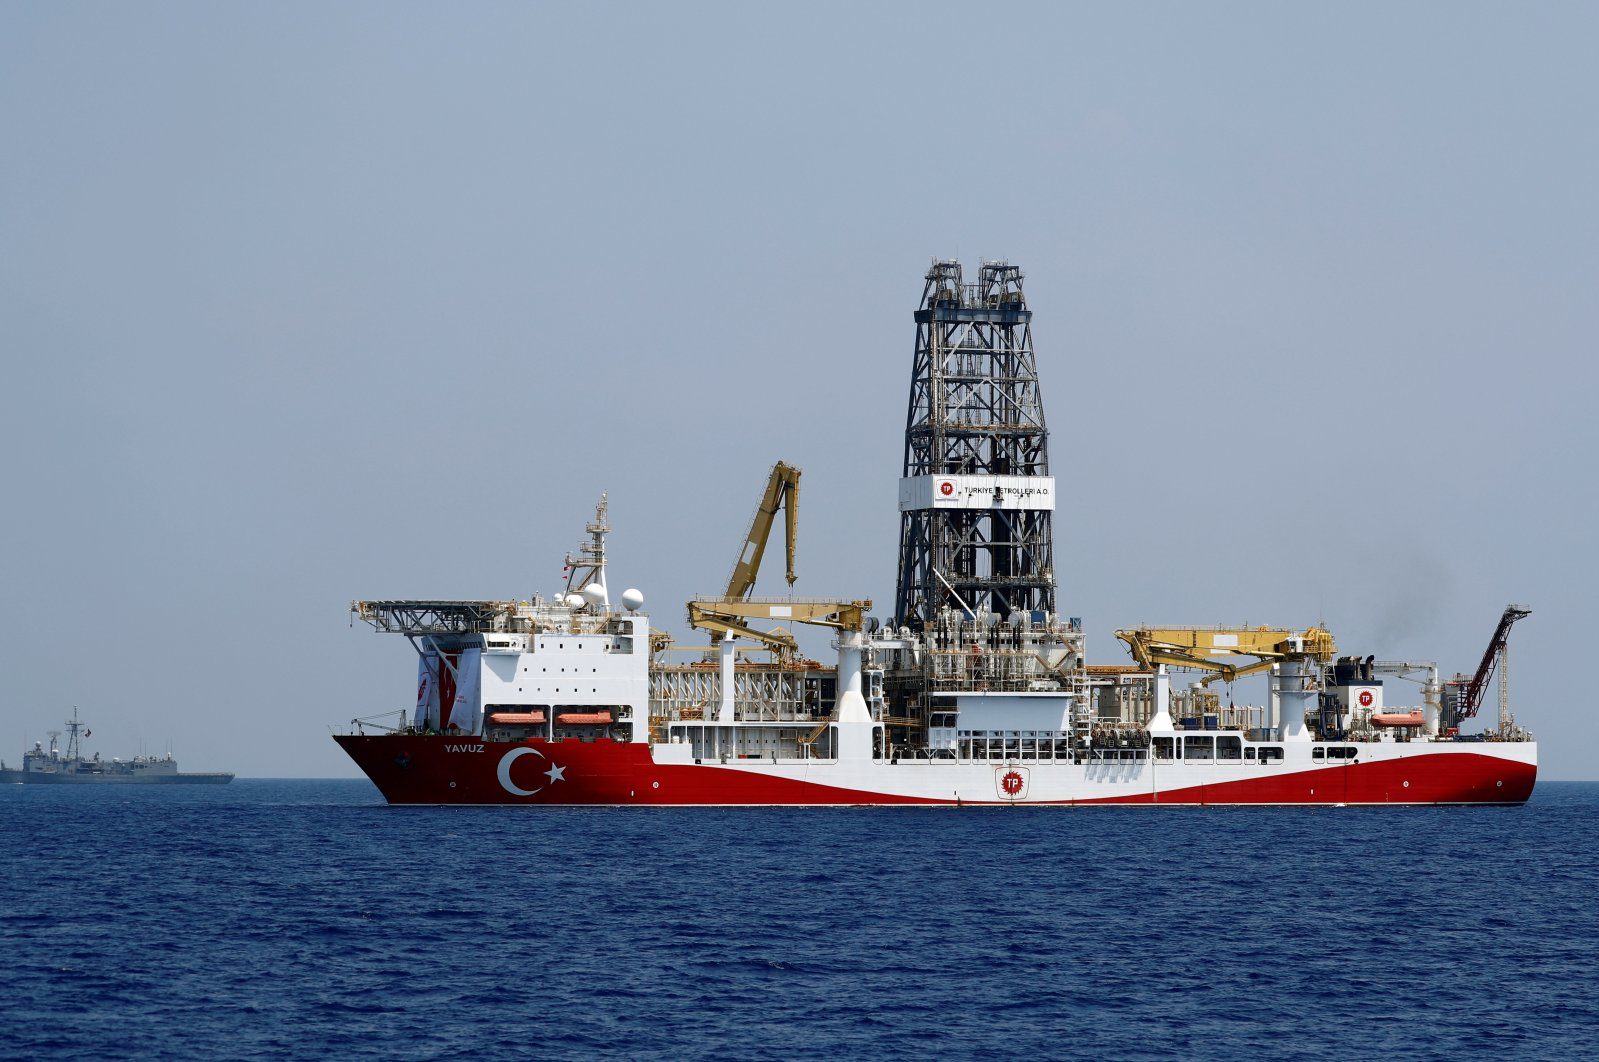 Turkish drilling vessel Yavuz is escorted by Turkish Navy frigate TCG Gemlik (F-492) in the eastern Mediterranean Sea, August 6, 2019. (REUTERS Photo)